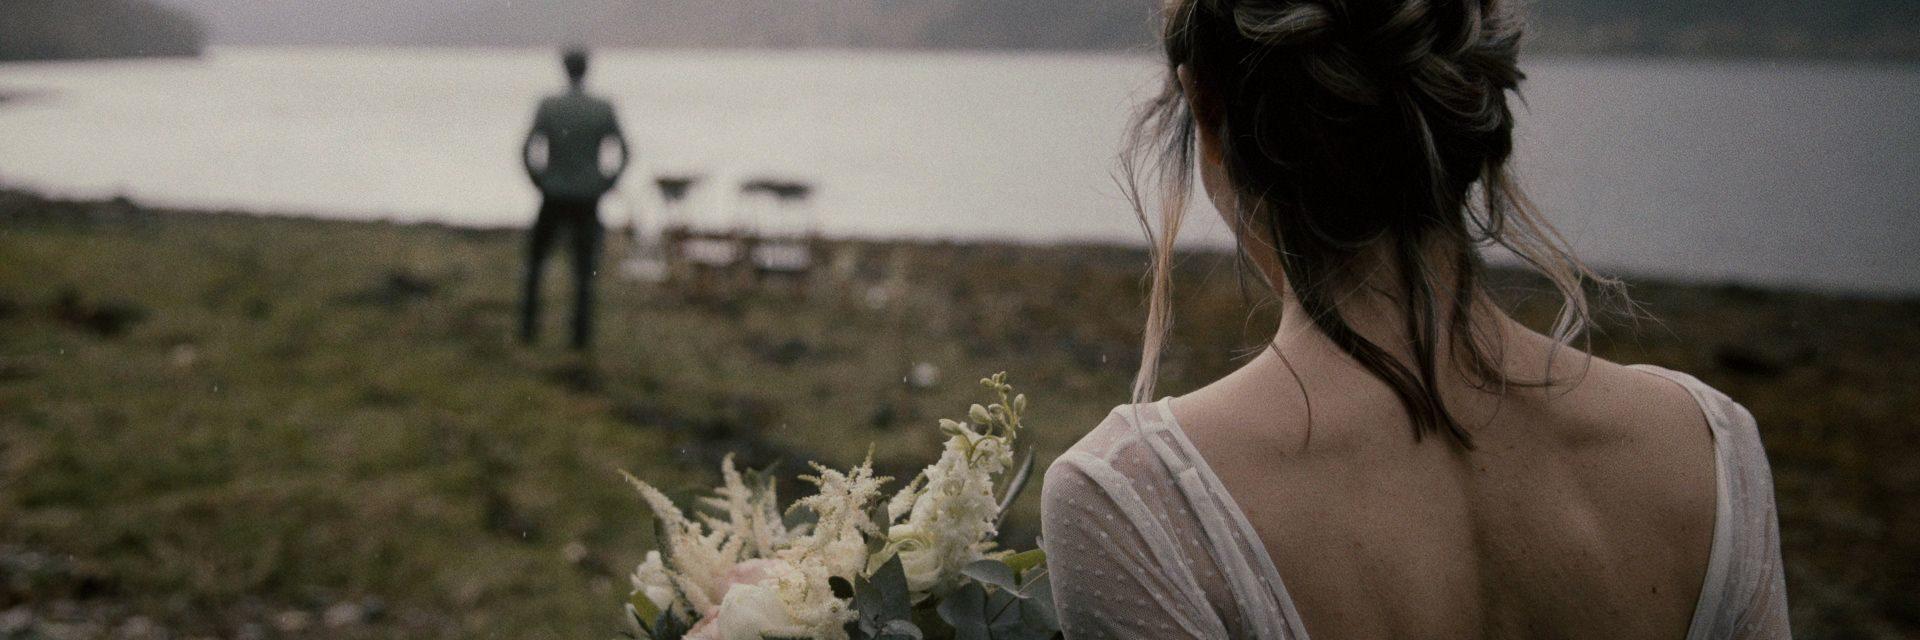 Faro-wedding-videographer-cinemate-films-02